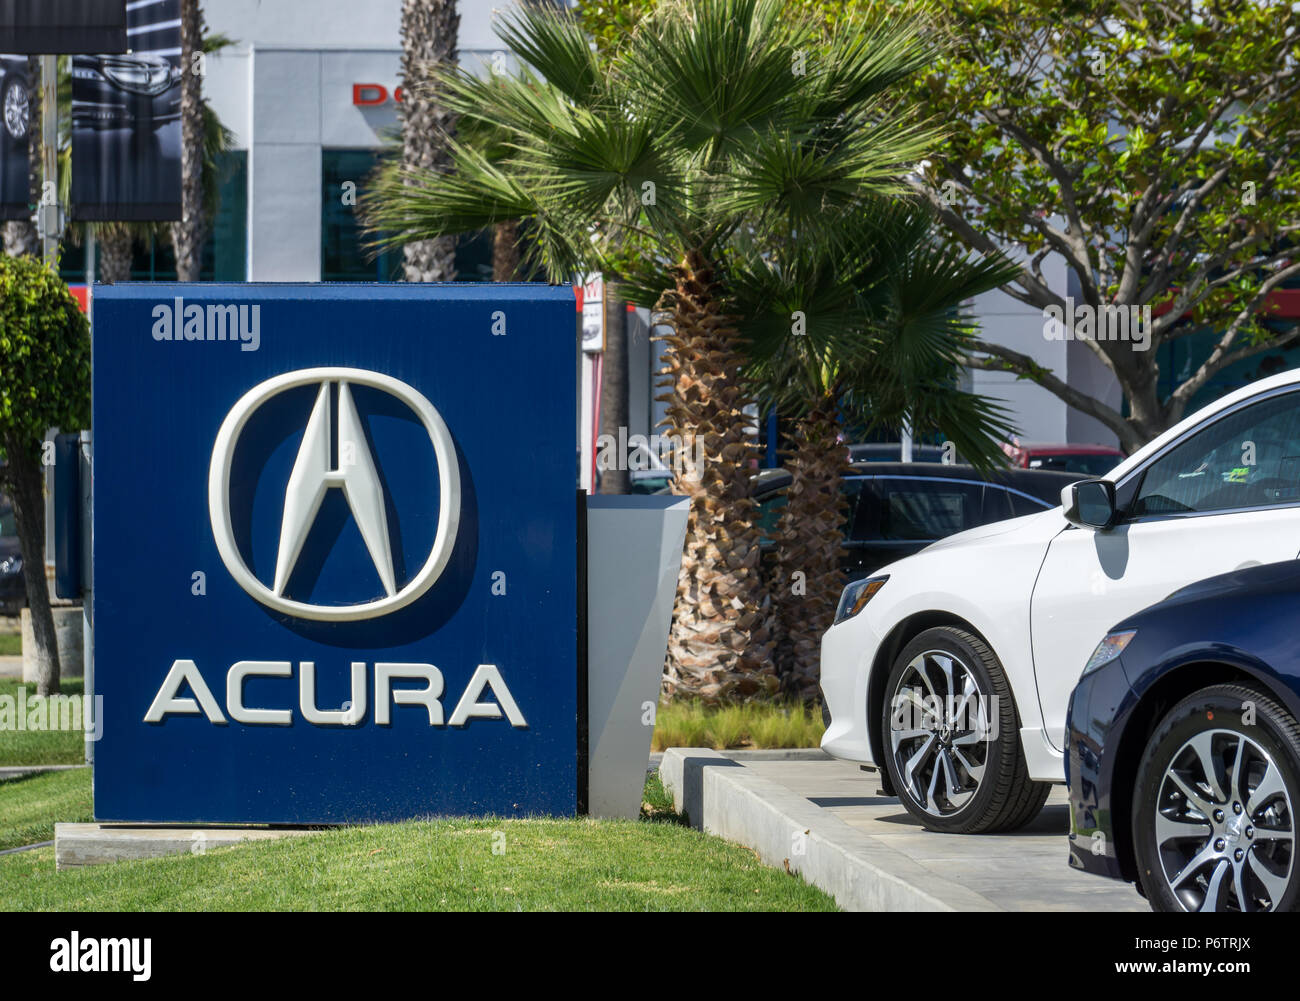 Los Angeles Ca Usa July 11 2015 Acura Automobile Dealership